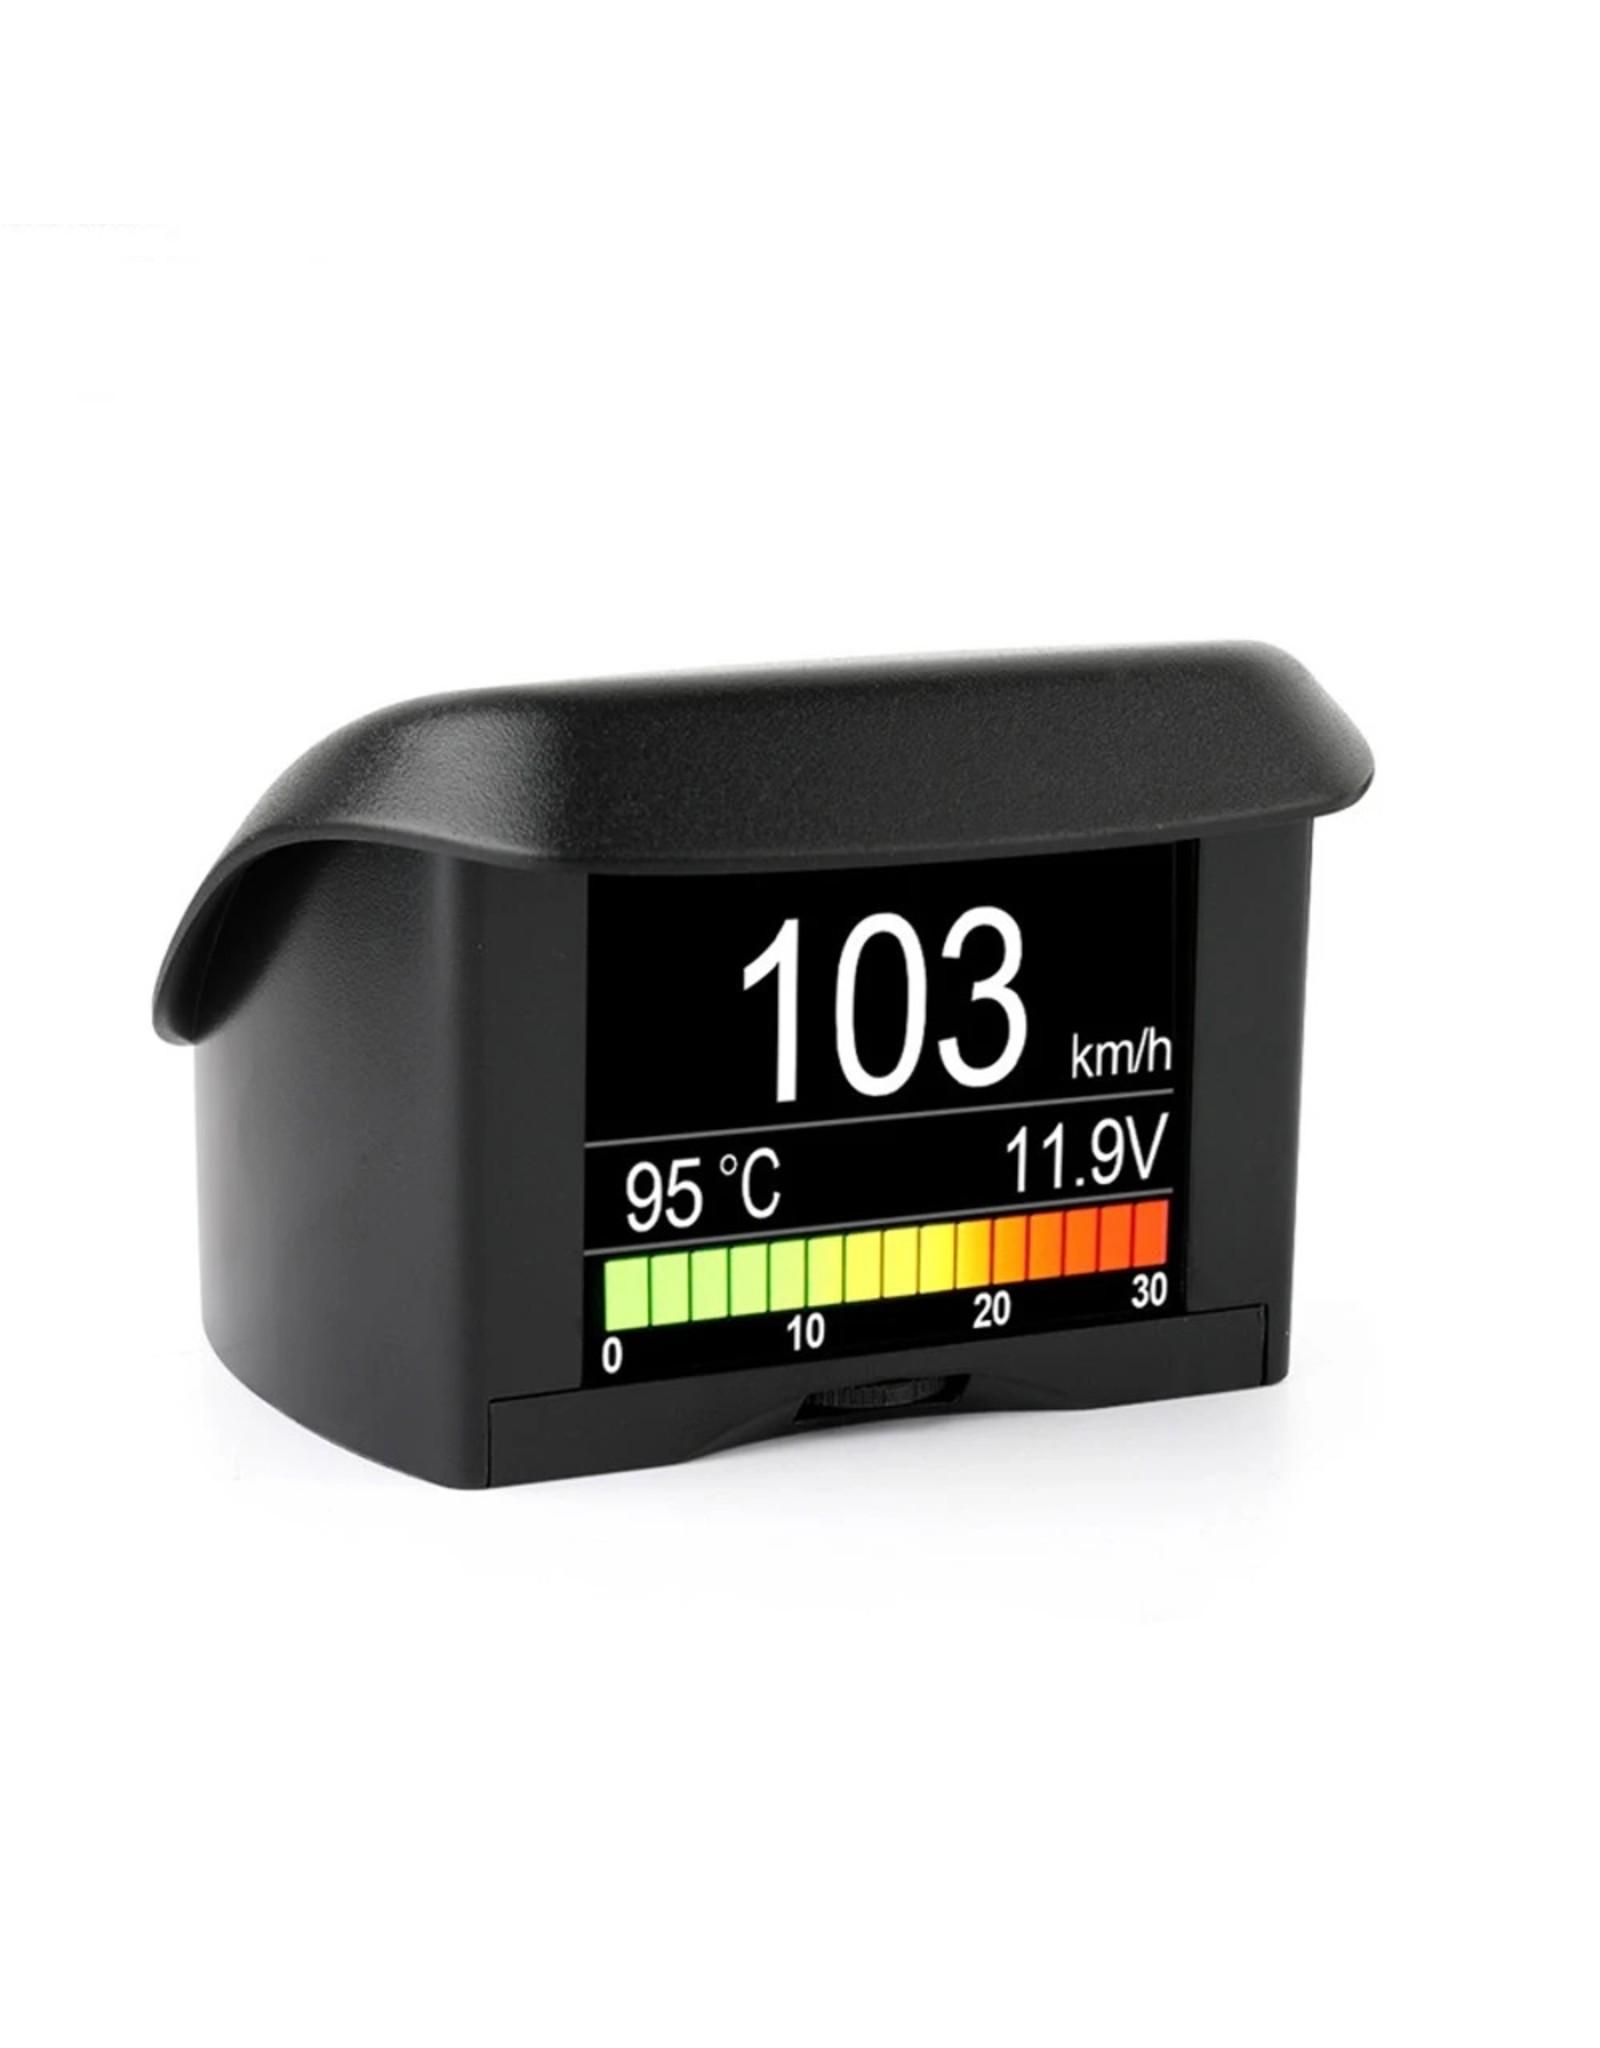 Auto Boordcomputer ANCEL A202 Auto Digitale OBD Computer Display Snelheidsmeter Brandstofverbruik meter Temperatuurmeter